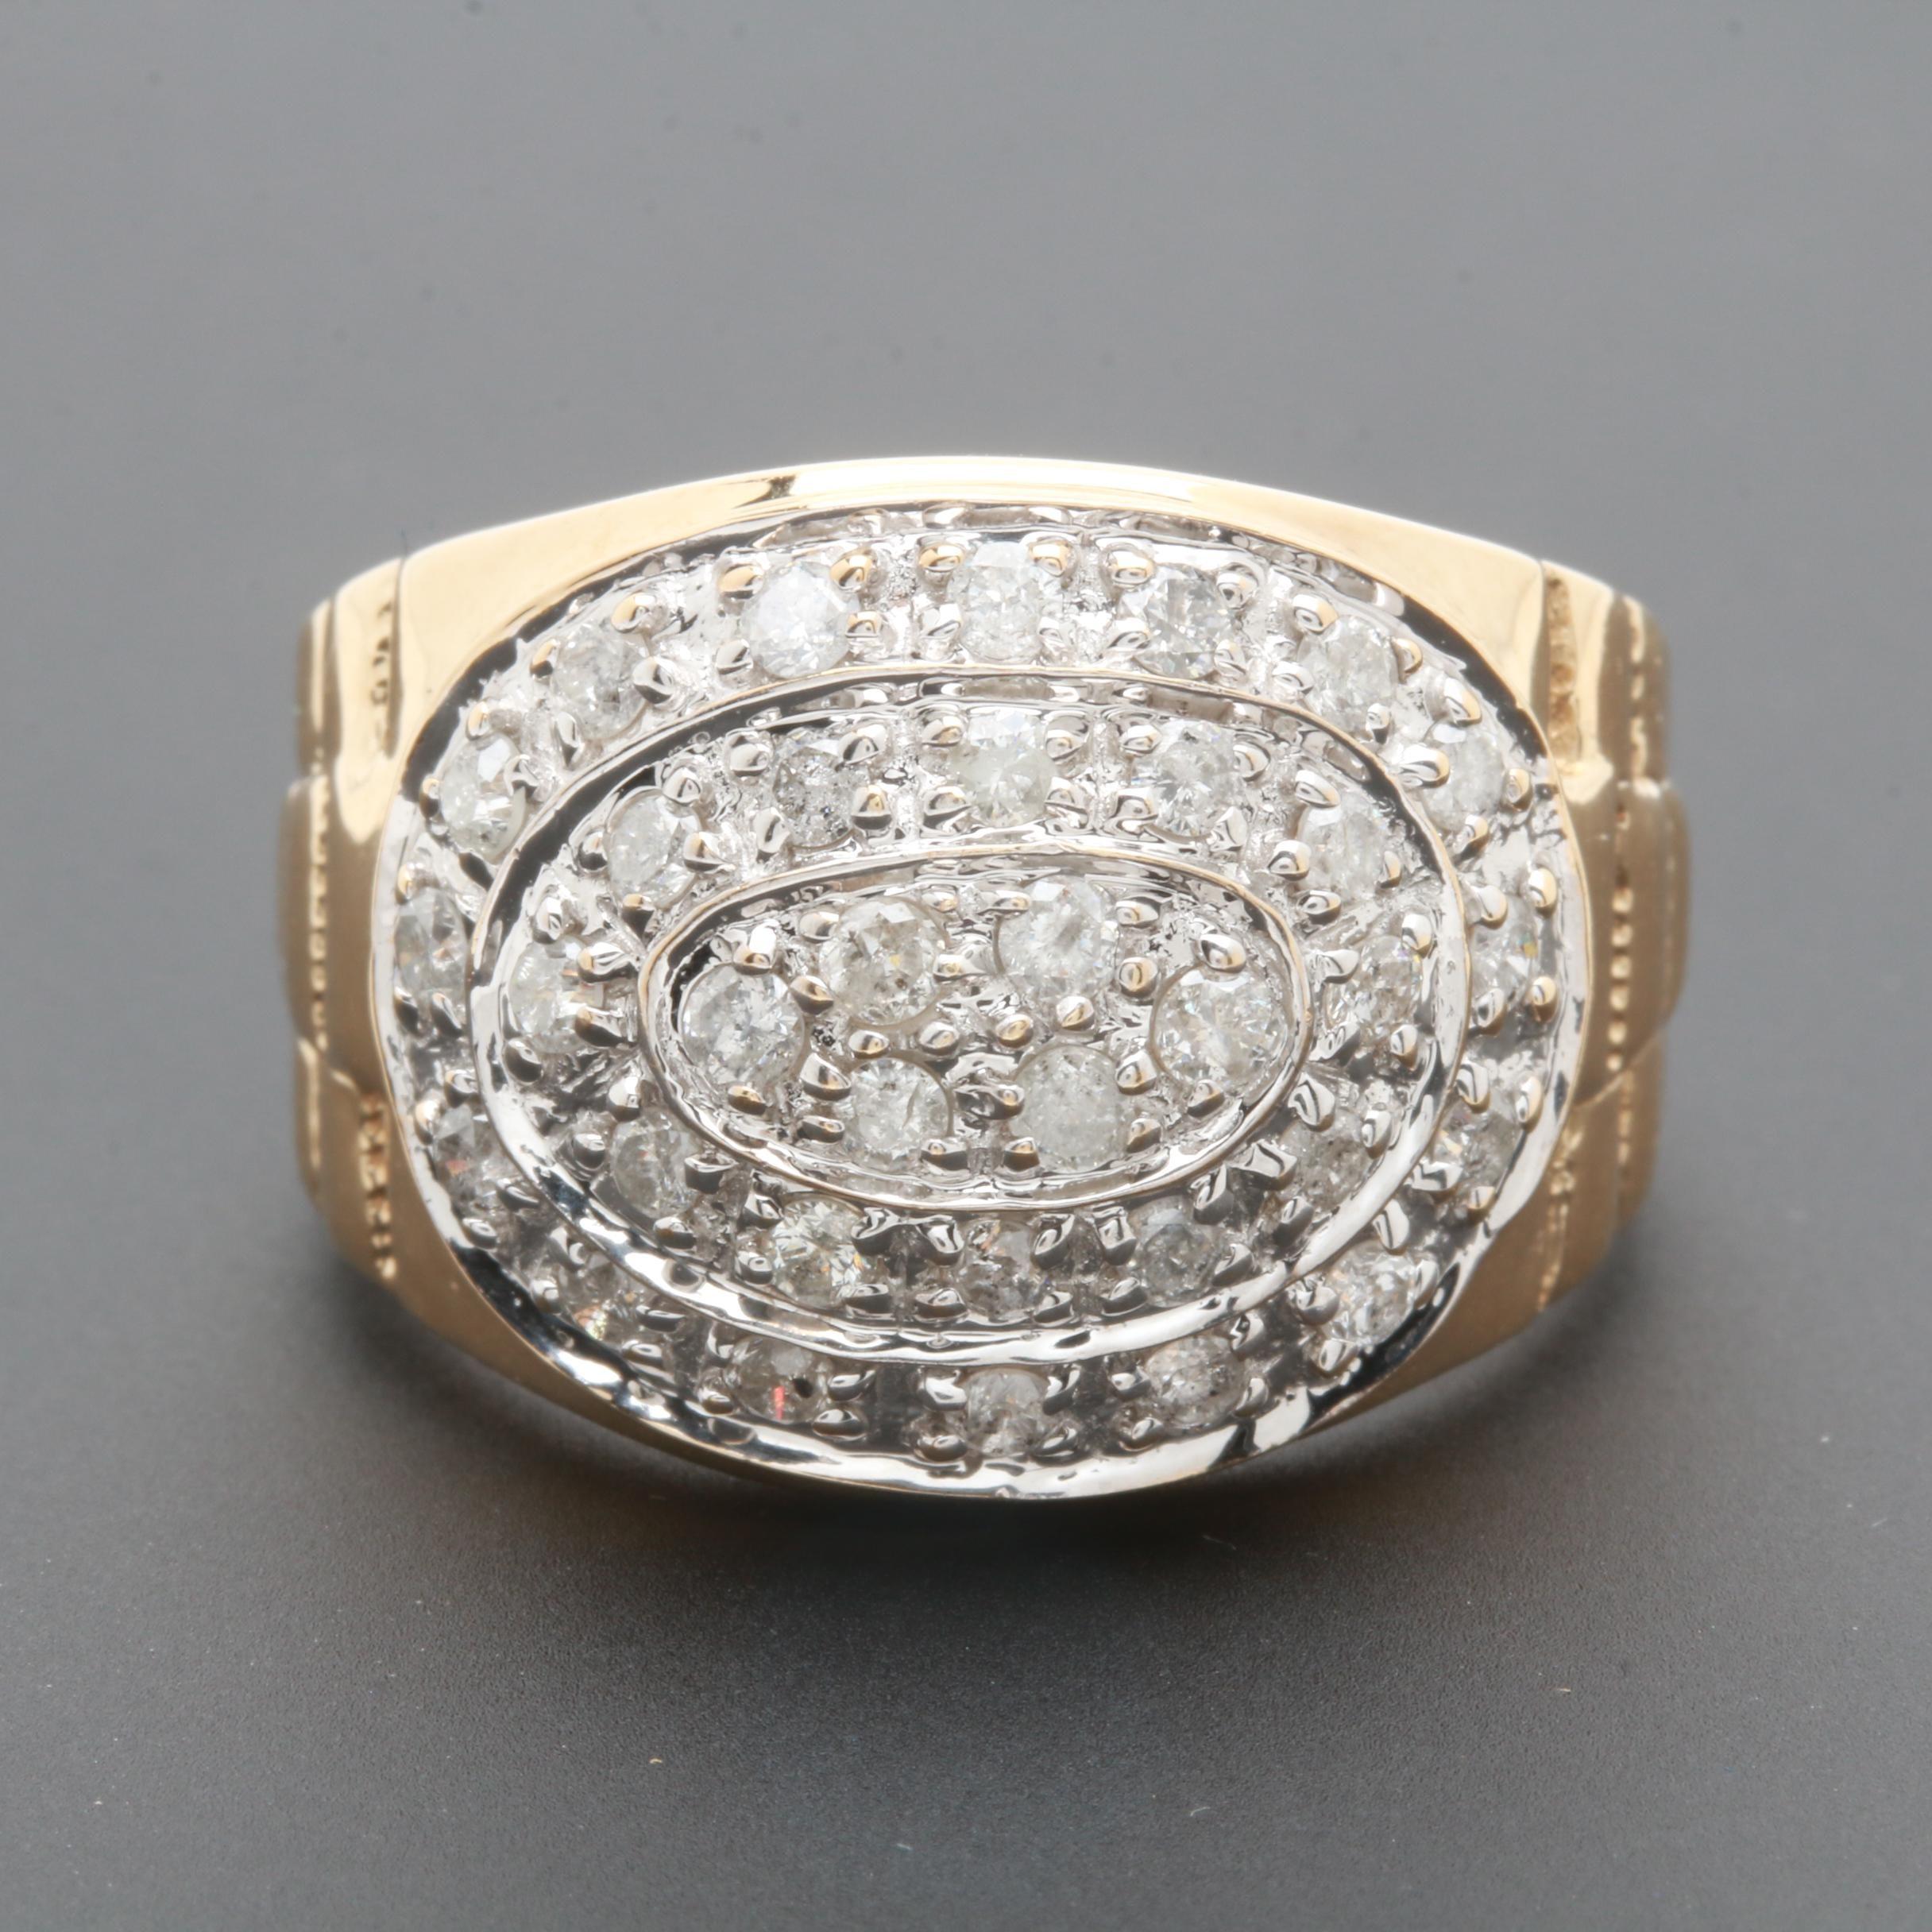 10K Yellow Gold 0.91 CTW Diamond Ring